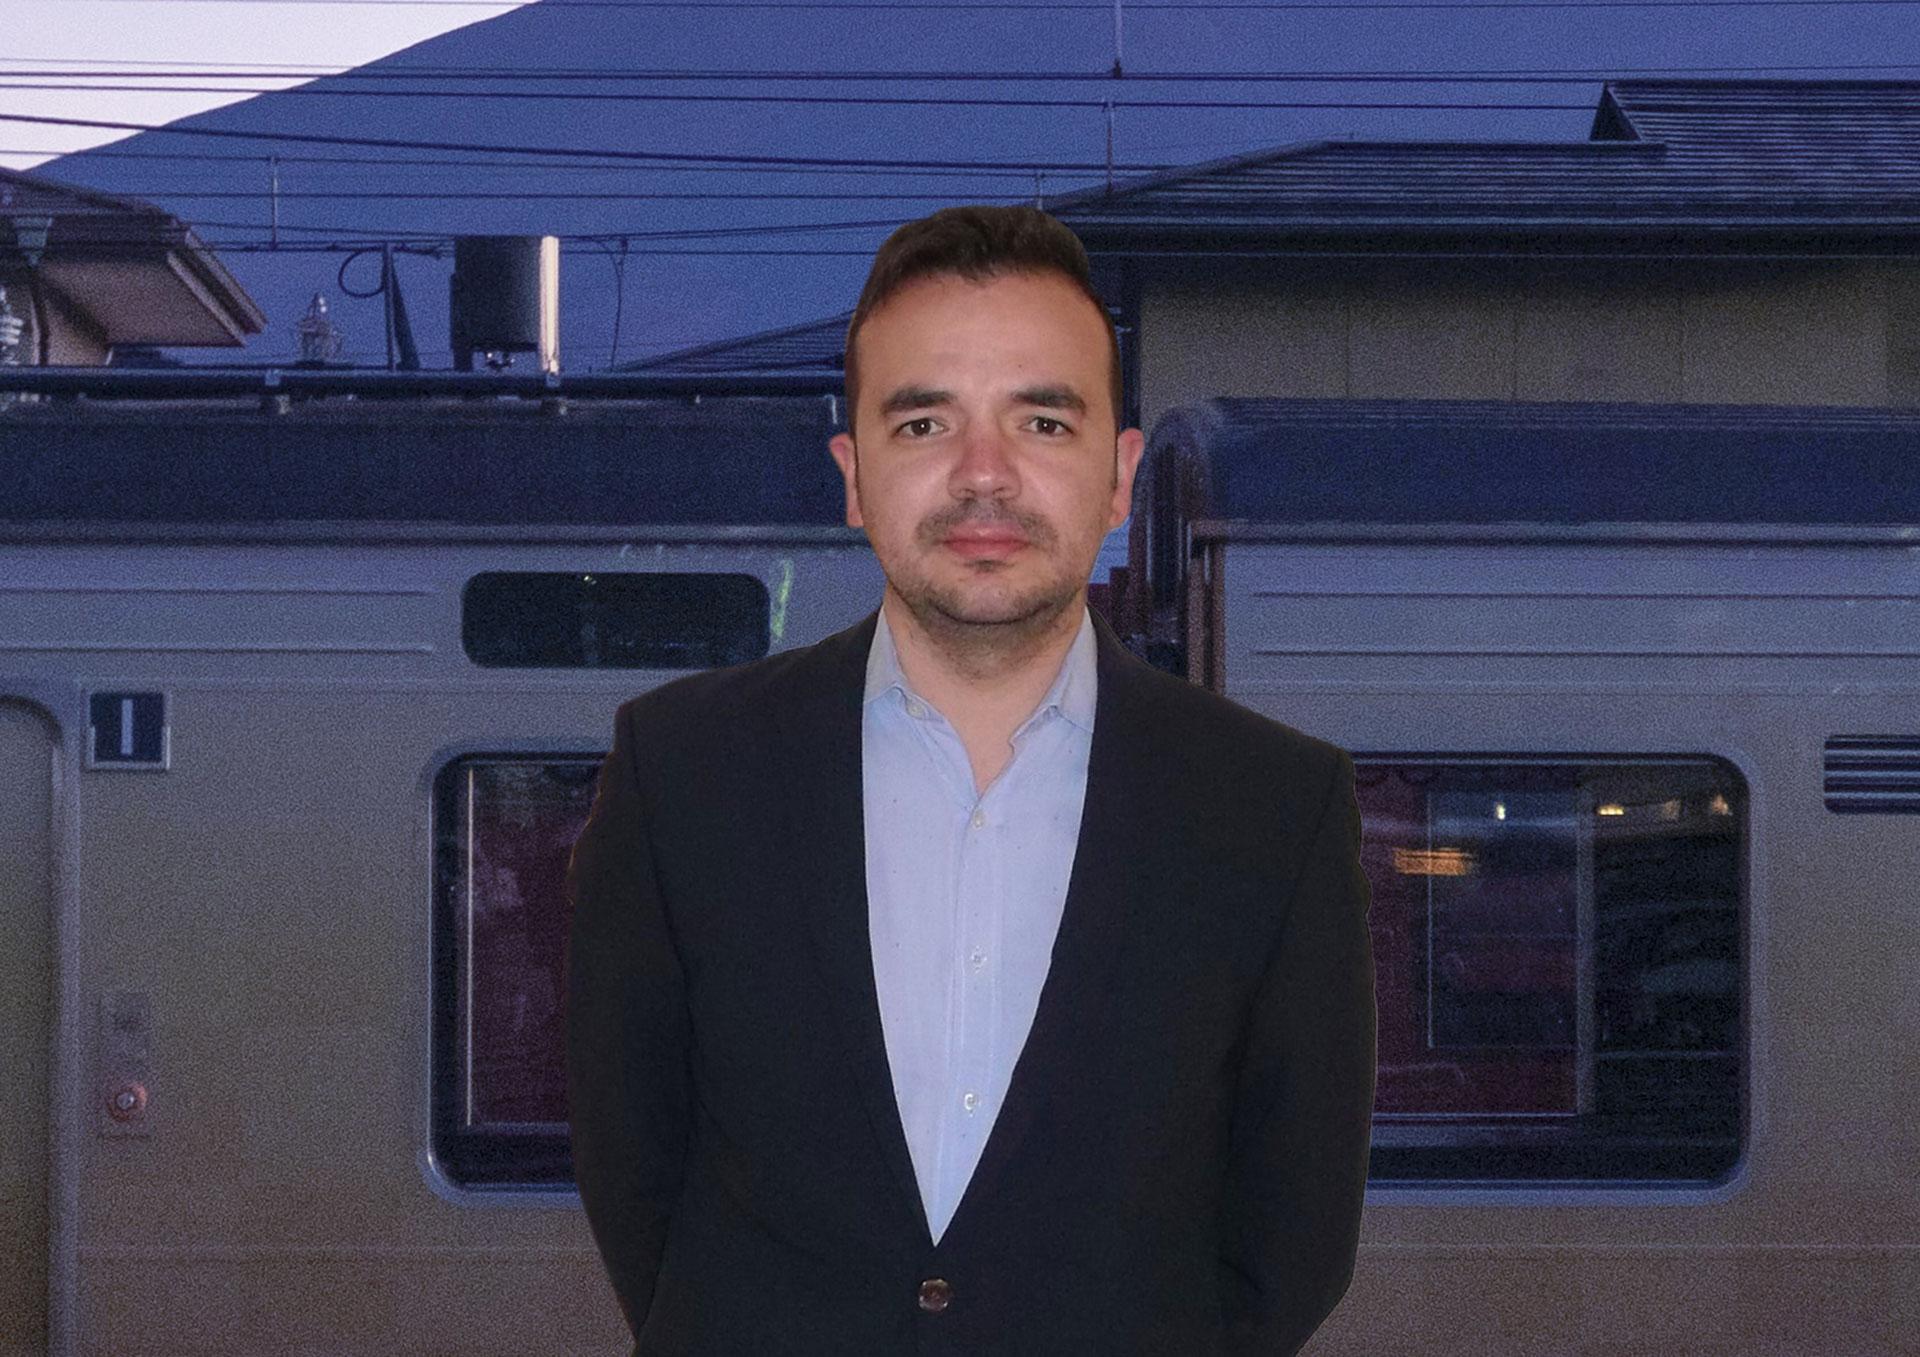 SERGIO LINARES TORRE